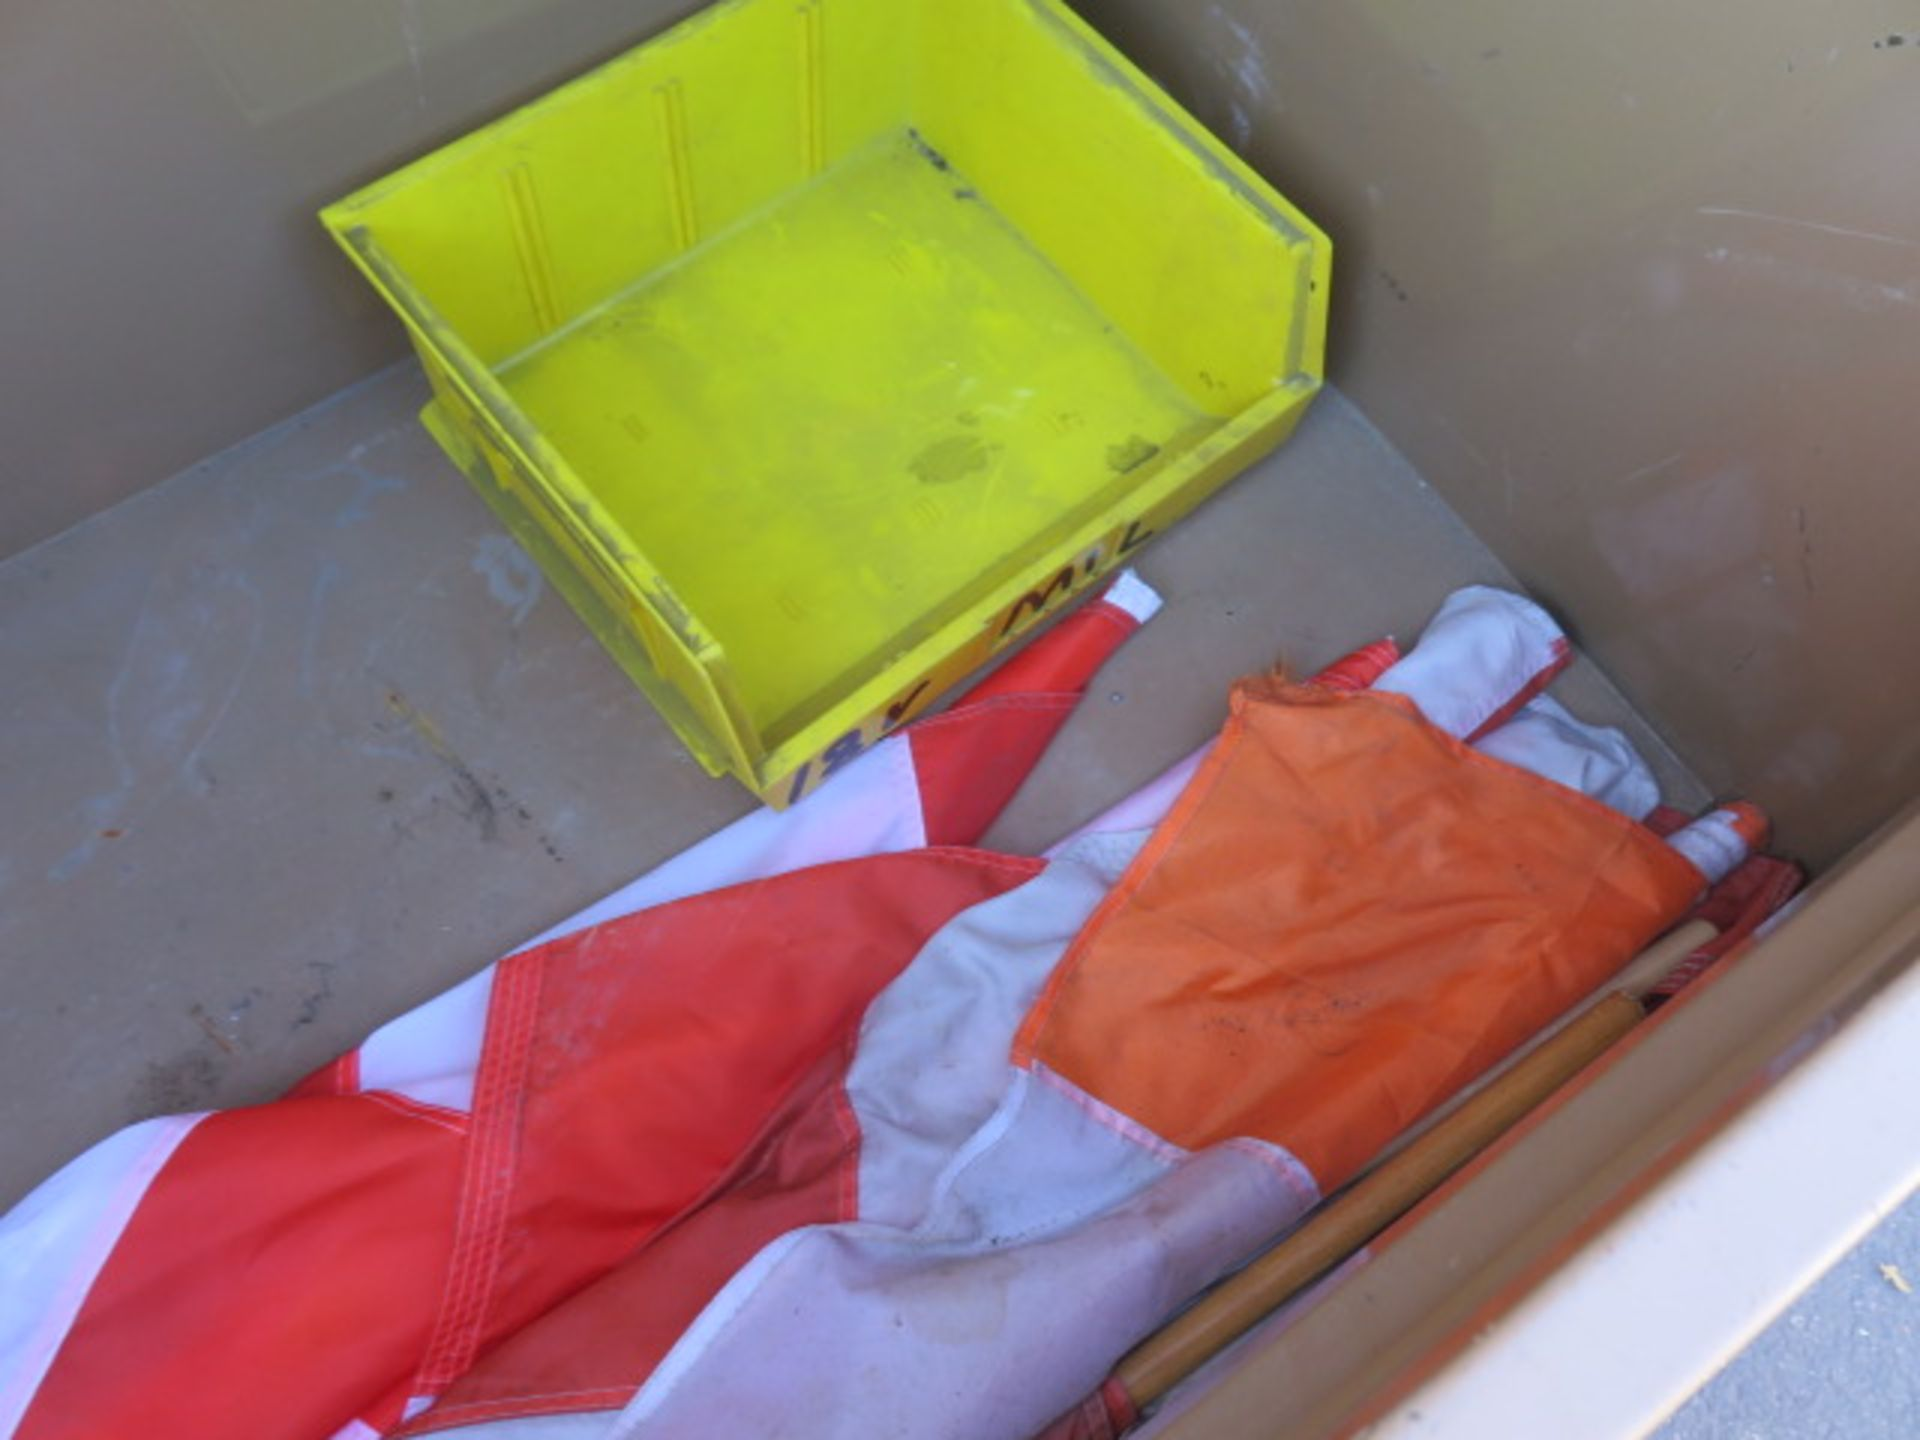 Knaack mdl. 89 Storagemaster Rolling Job Box (SOLD AS-IS - NO WARRANTY) - Image 7 of 9